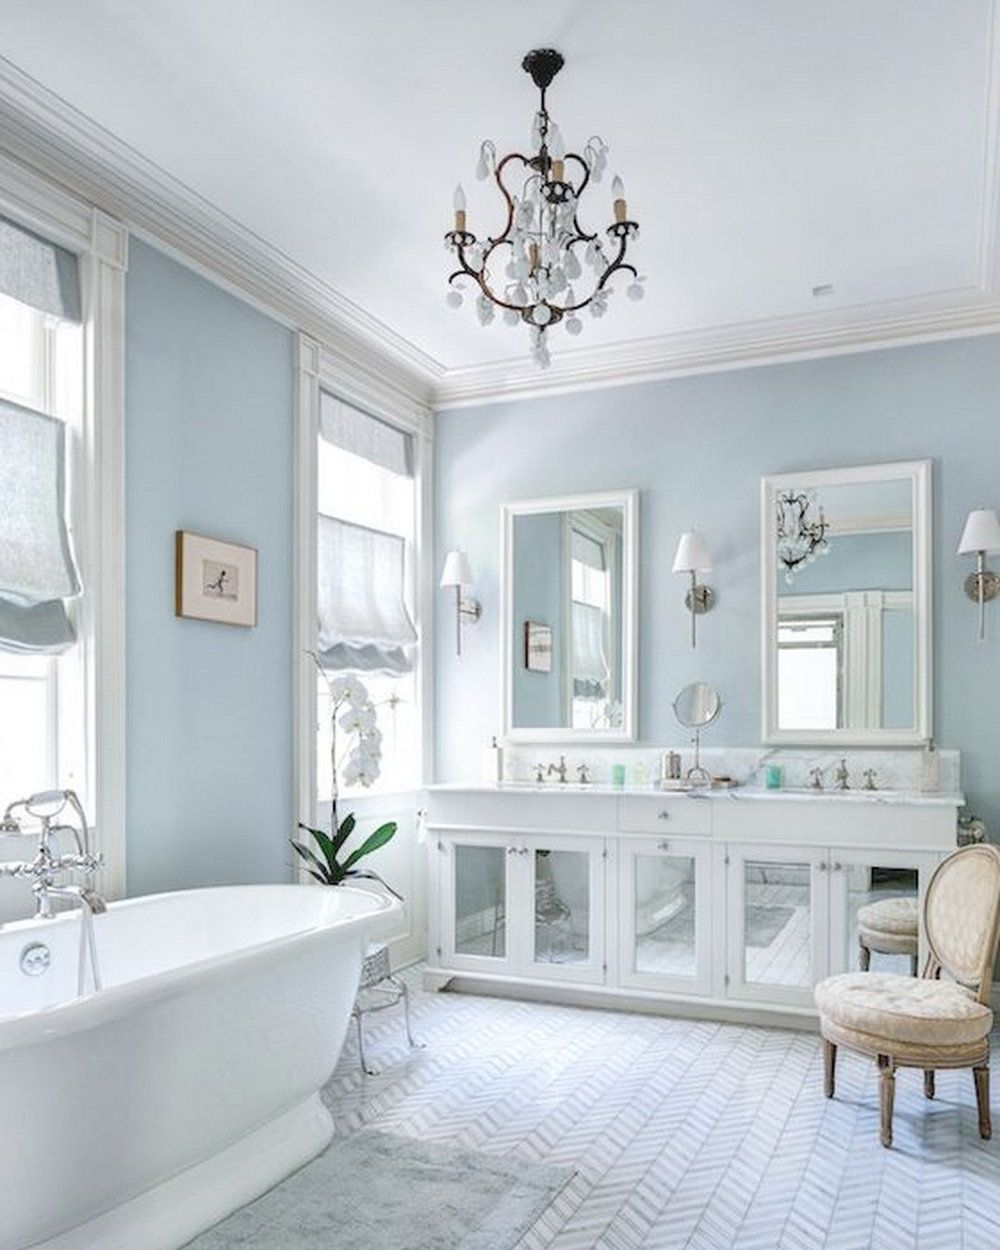 12 Luxurious Bathroom Design Ideas | Pinterest | French vanity, Blue ...